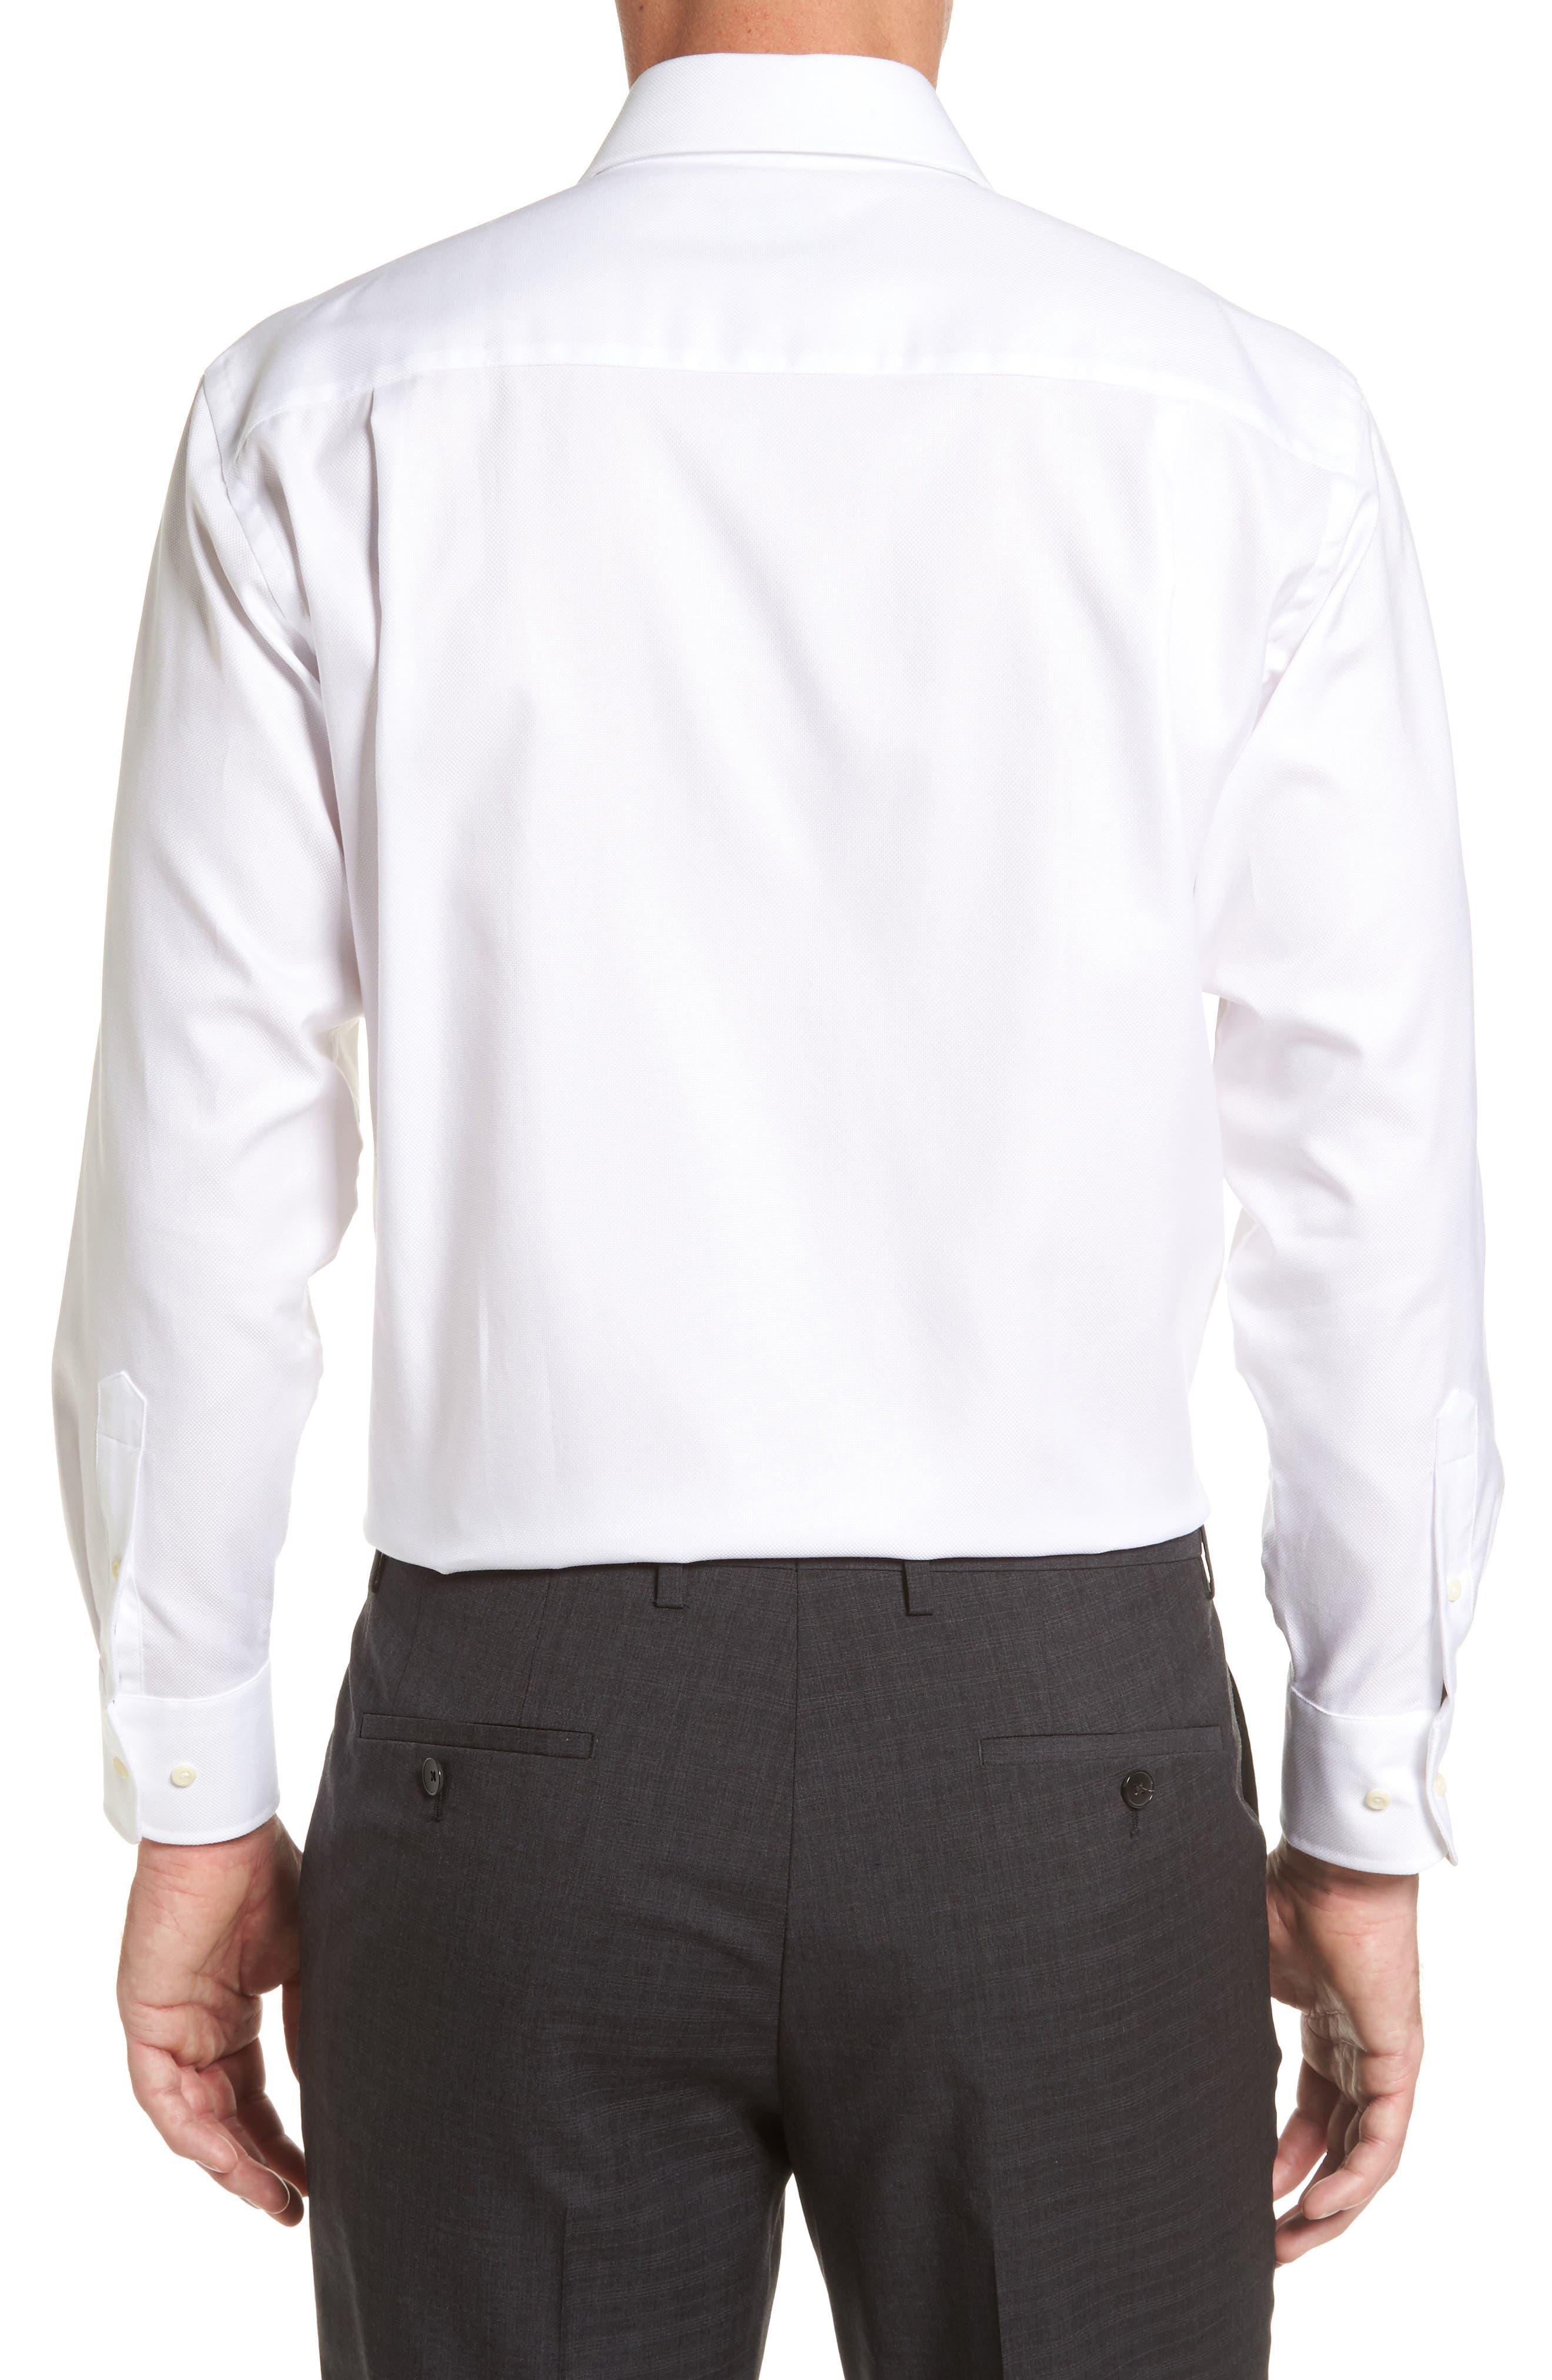 DAVID DONAHUE, Regular Fit Oxford Dress Shirt, Alternate thumbnail 3, color, WHITE